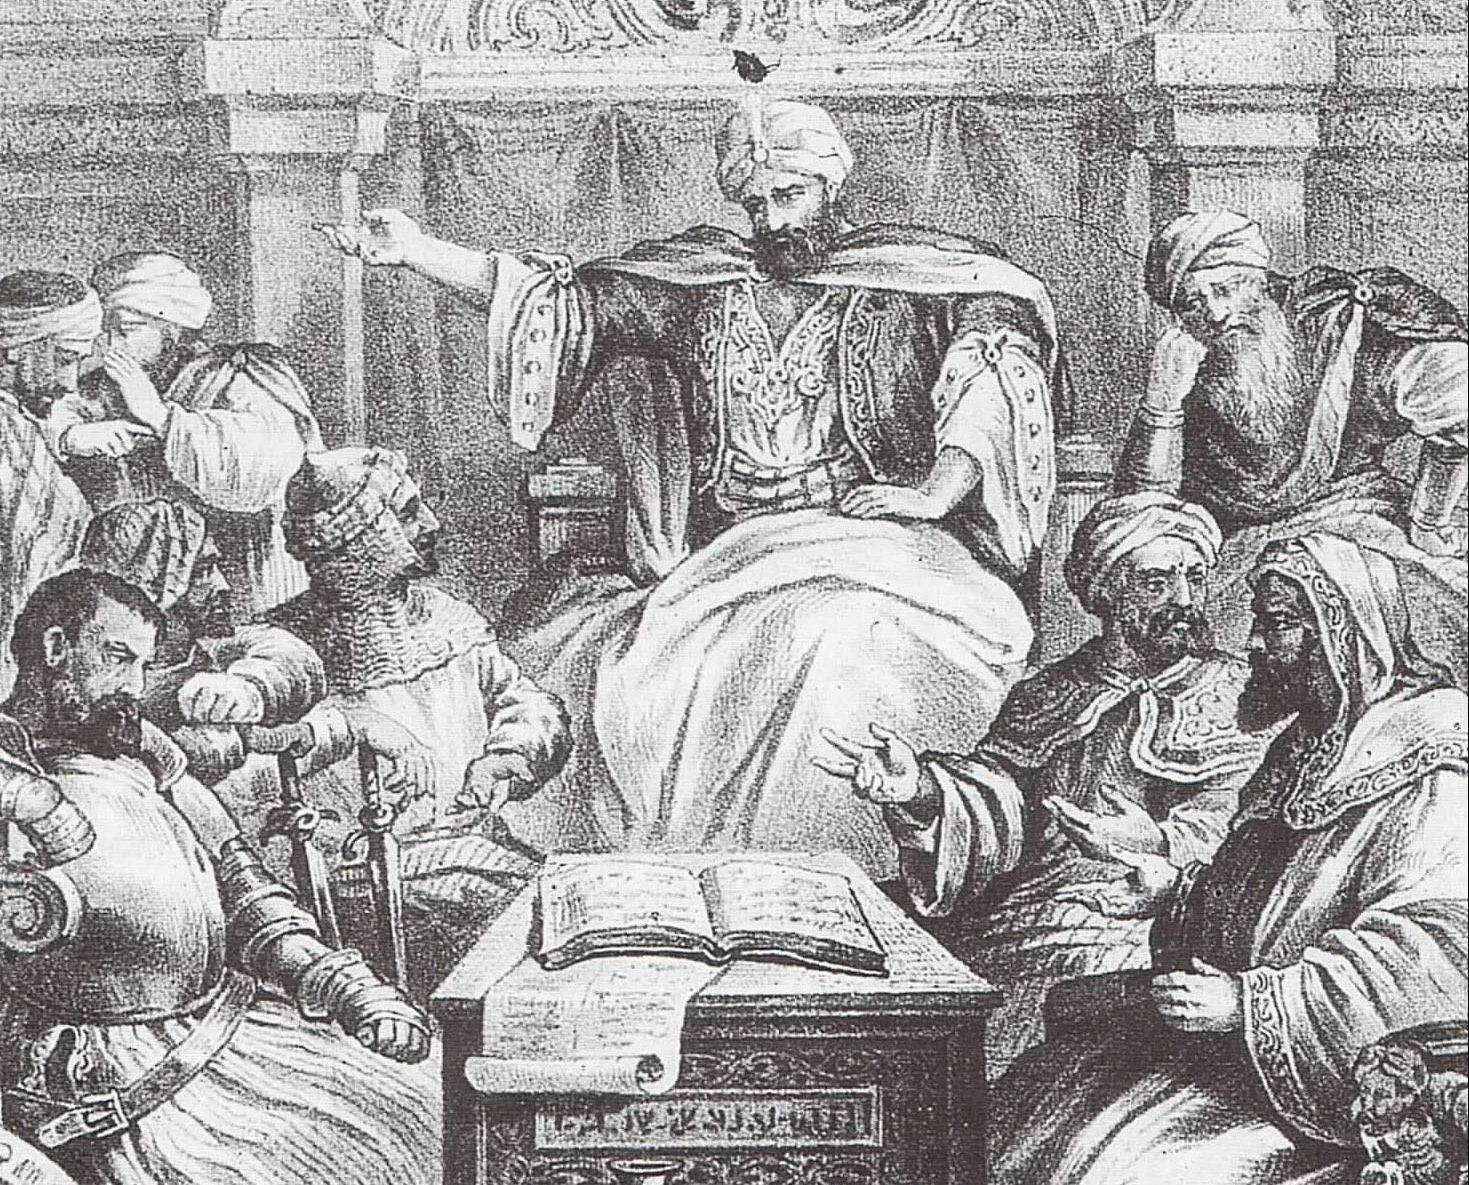 El Emir Muhammad I: El fundador de Madrid